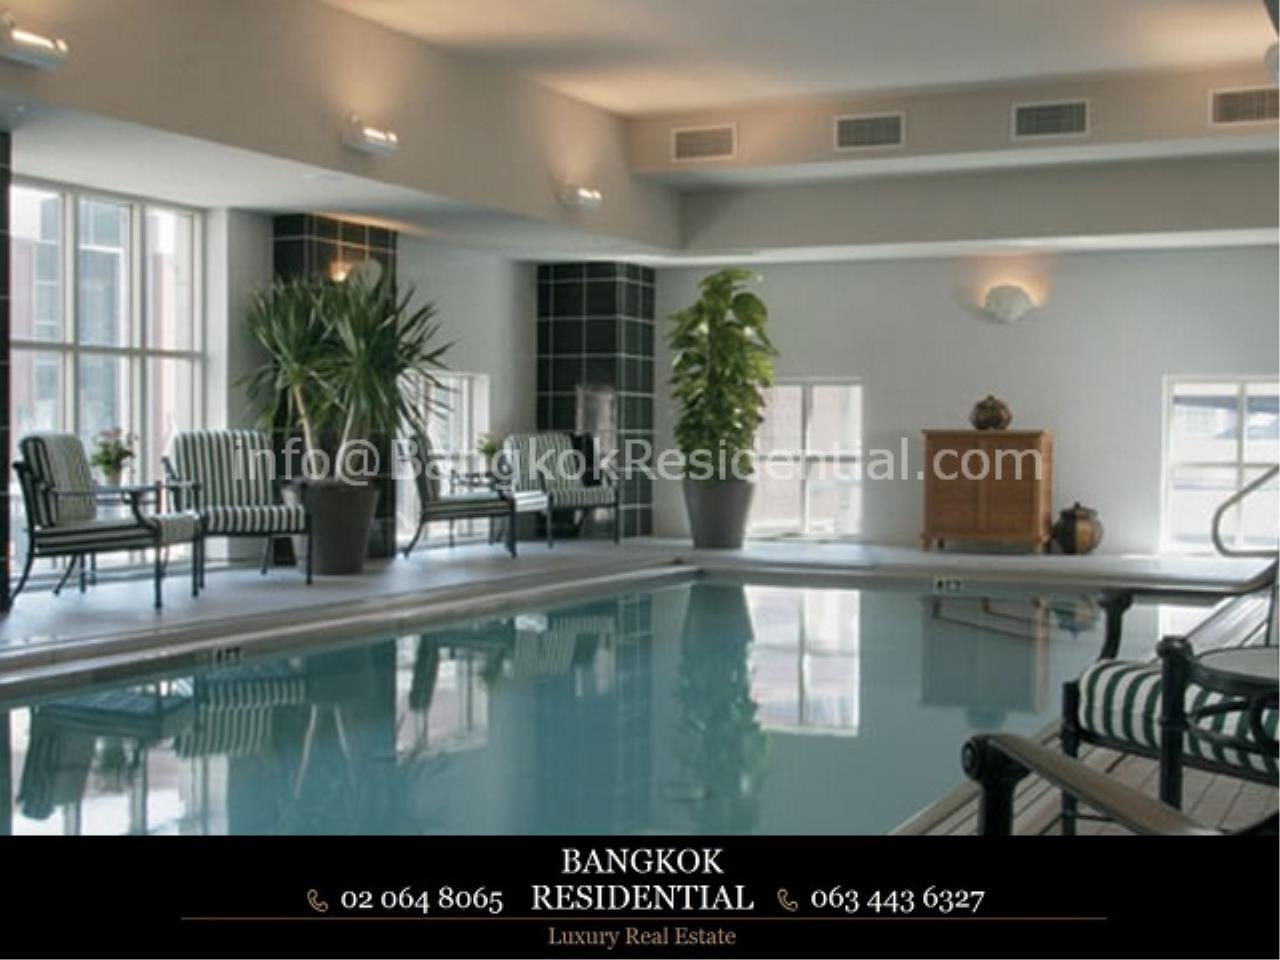 Bangkok Residential Agency's 2BR St. Louis Grand Terrace For Rent (BR5995CD) 4